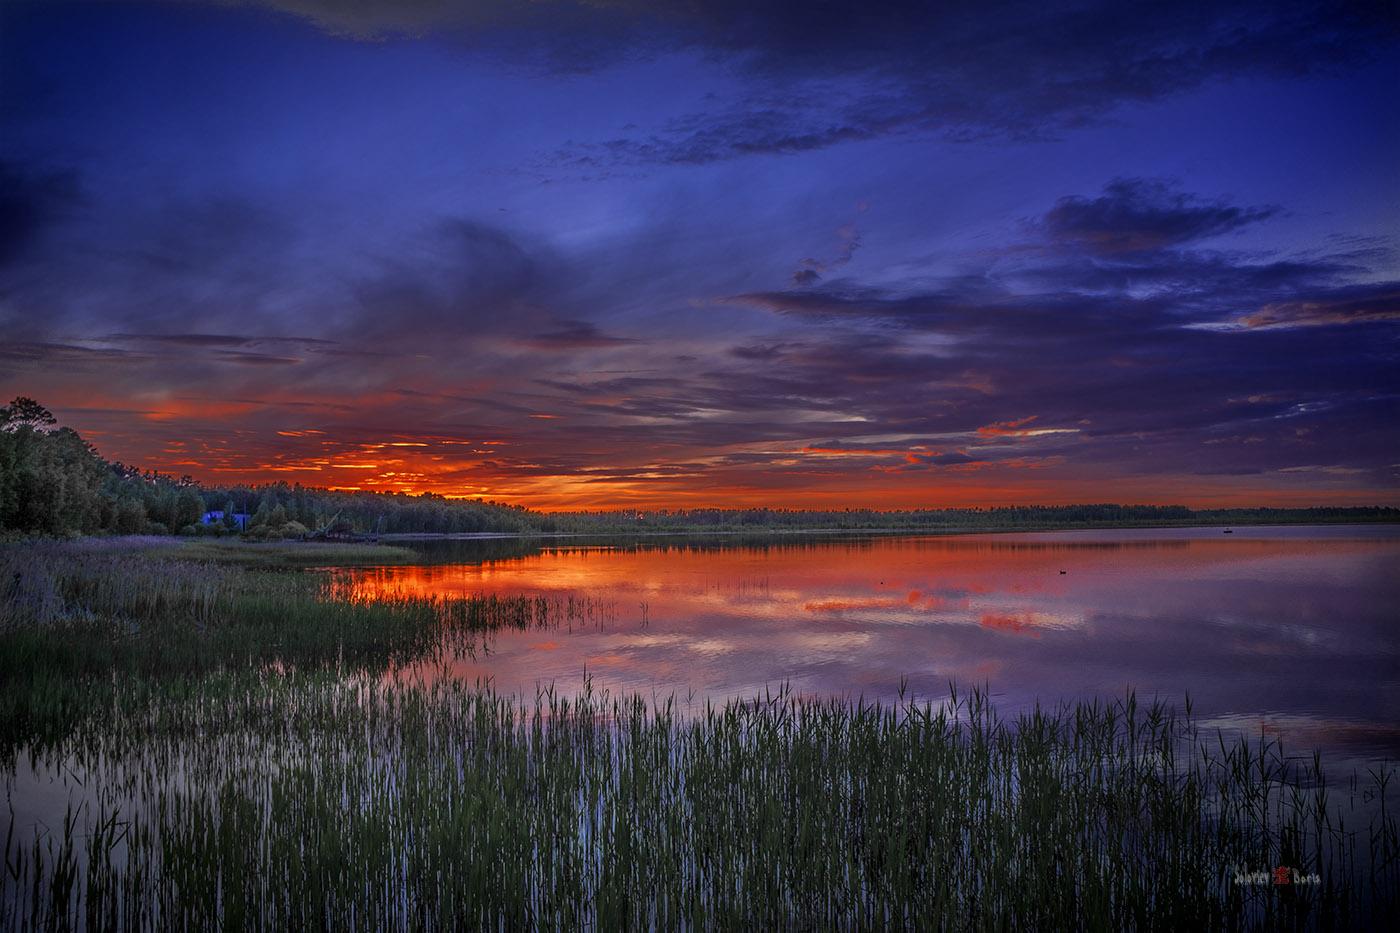 Озера Тараскуль в Тюменской области. Вечерний пейзаж. Снято на SONY NEX7